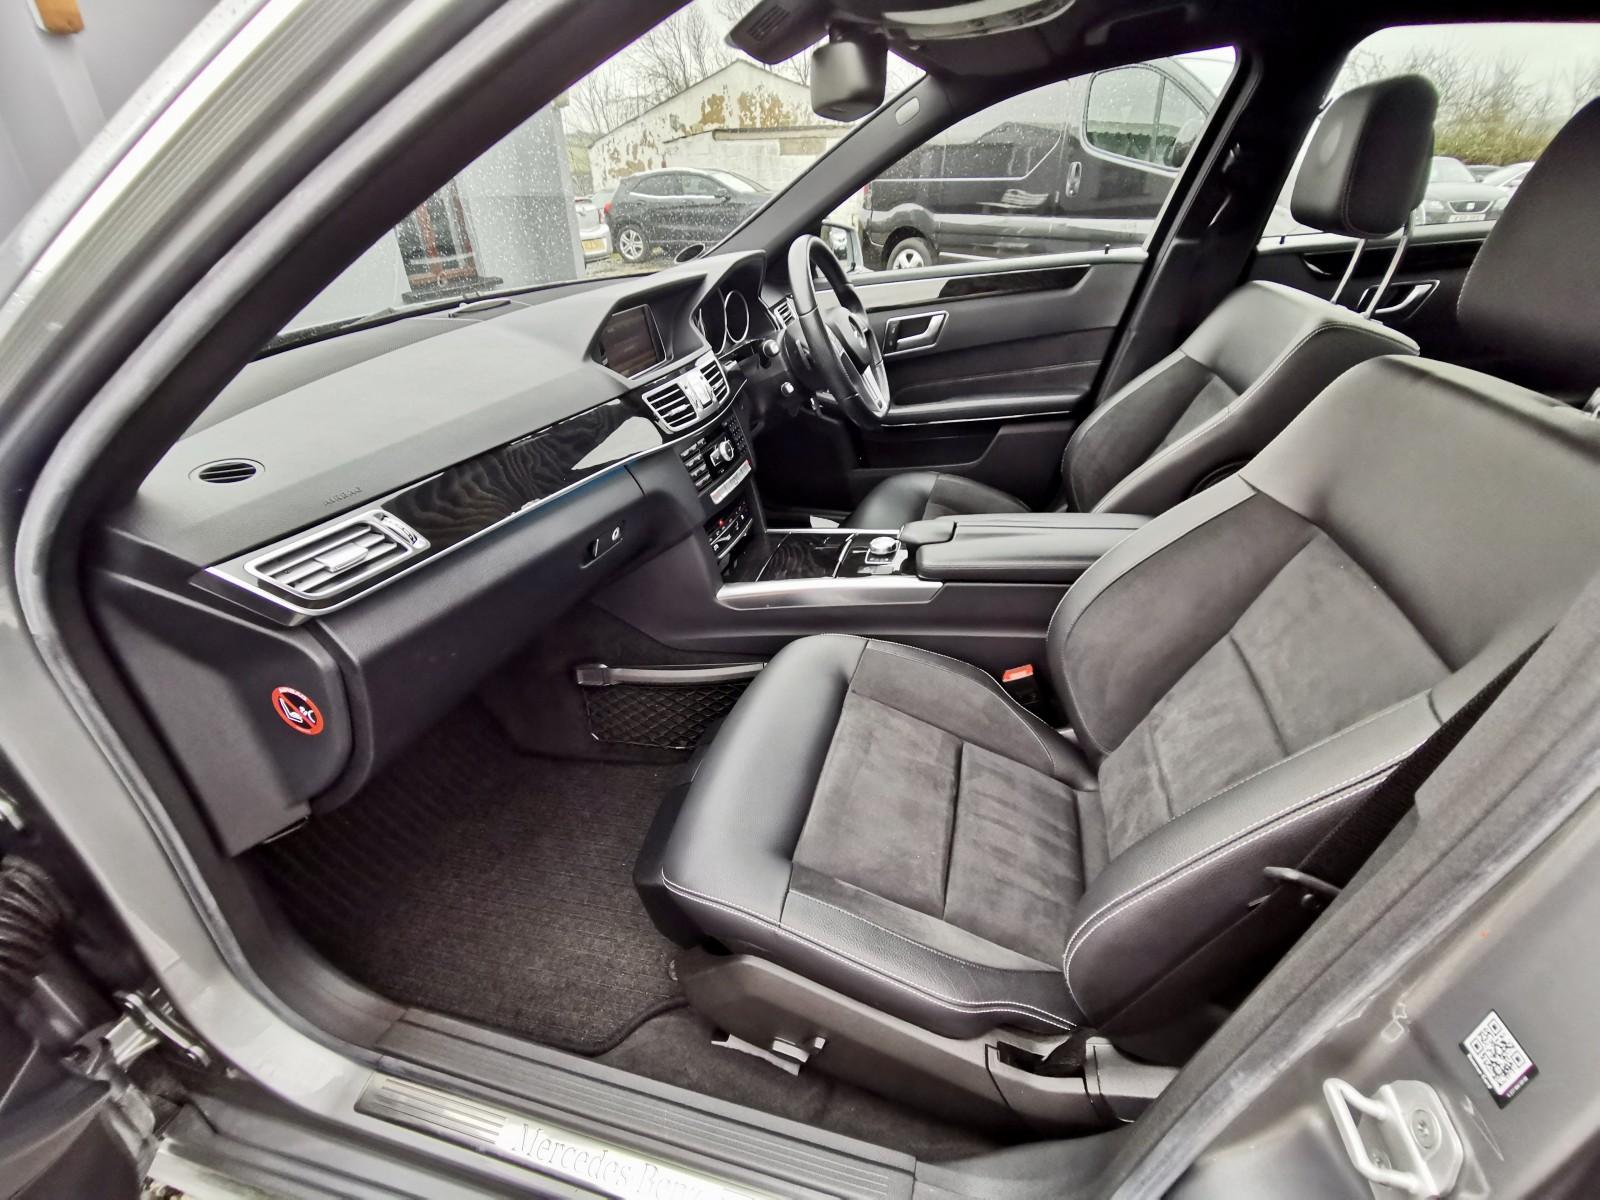 2013 Mercedes-Benz E Class E250 CDI AMG SPORT Diesel Automatic – BC Autosales 17A Airfield Road, Eglinton, Londonderry BT47 3PZ, UK full